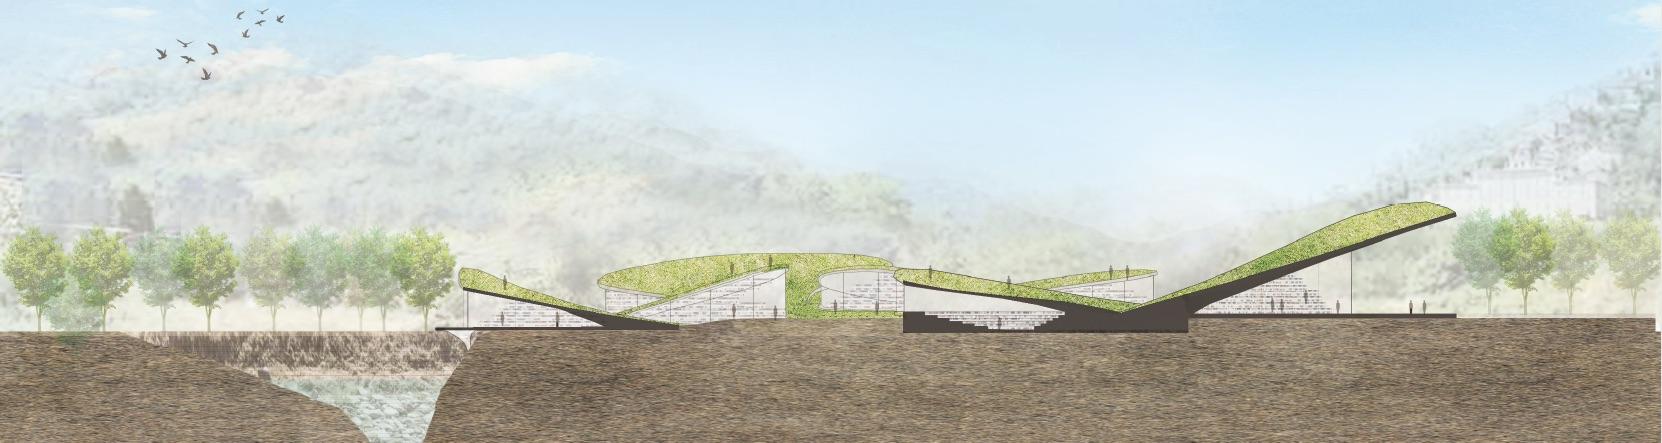 Section Yasui Design Lab.2017}